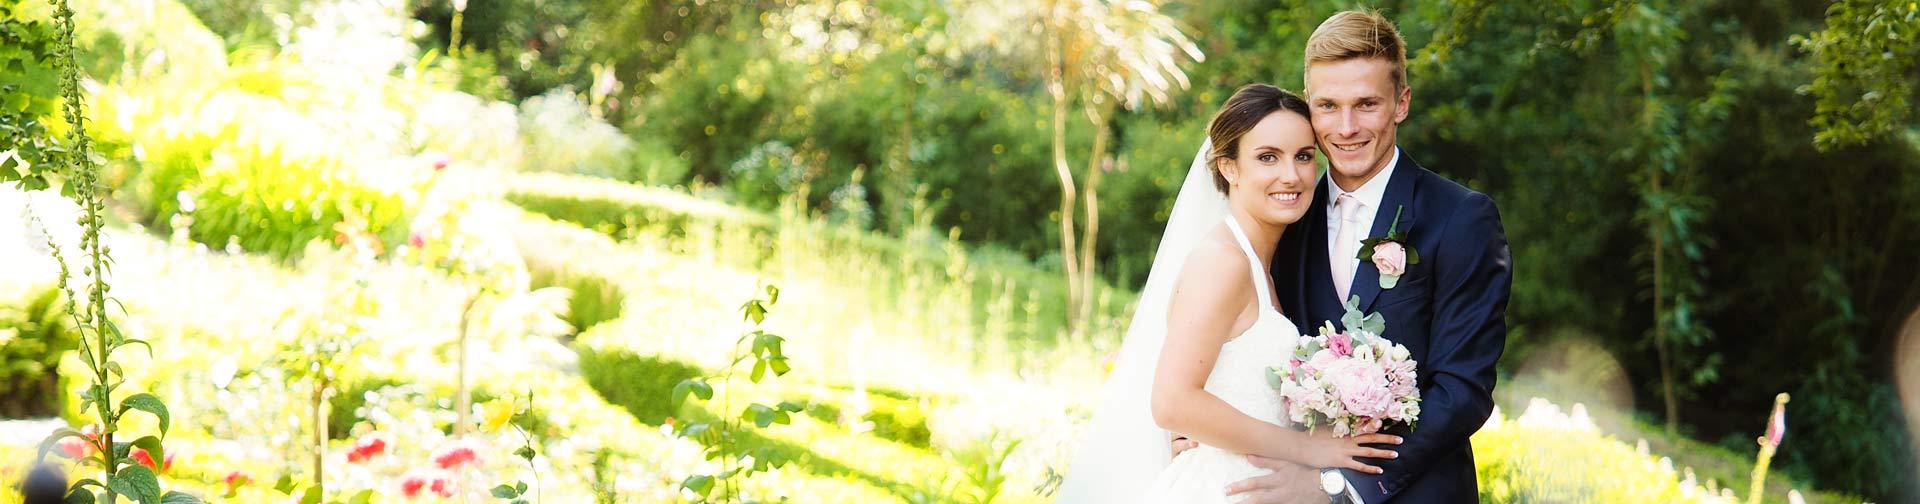 Wedding photography at Raithwaite Hall